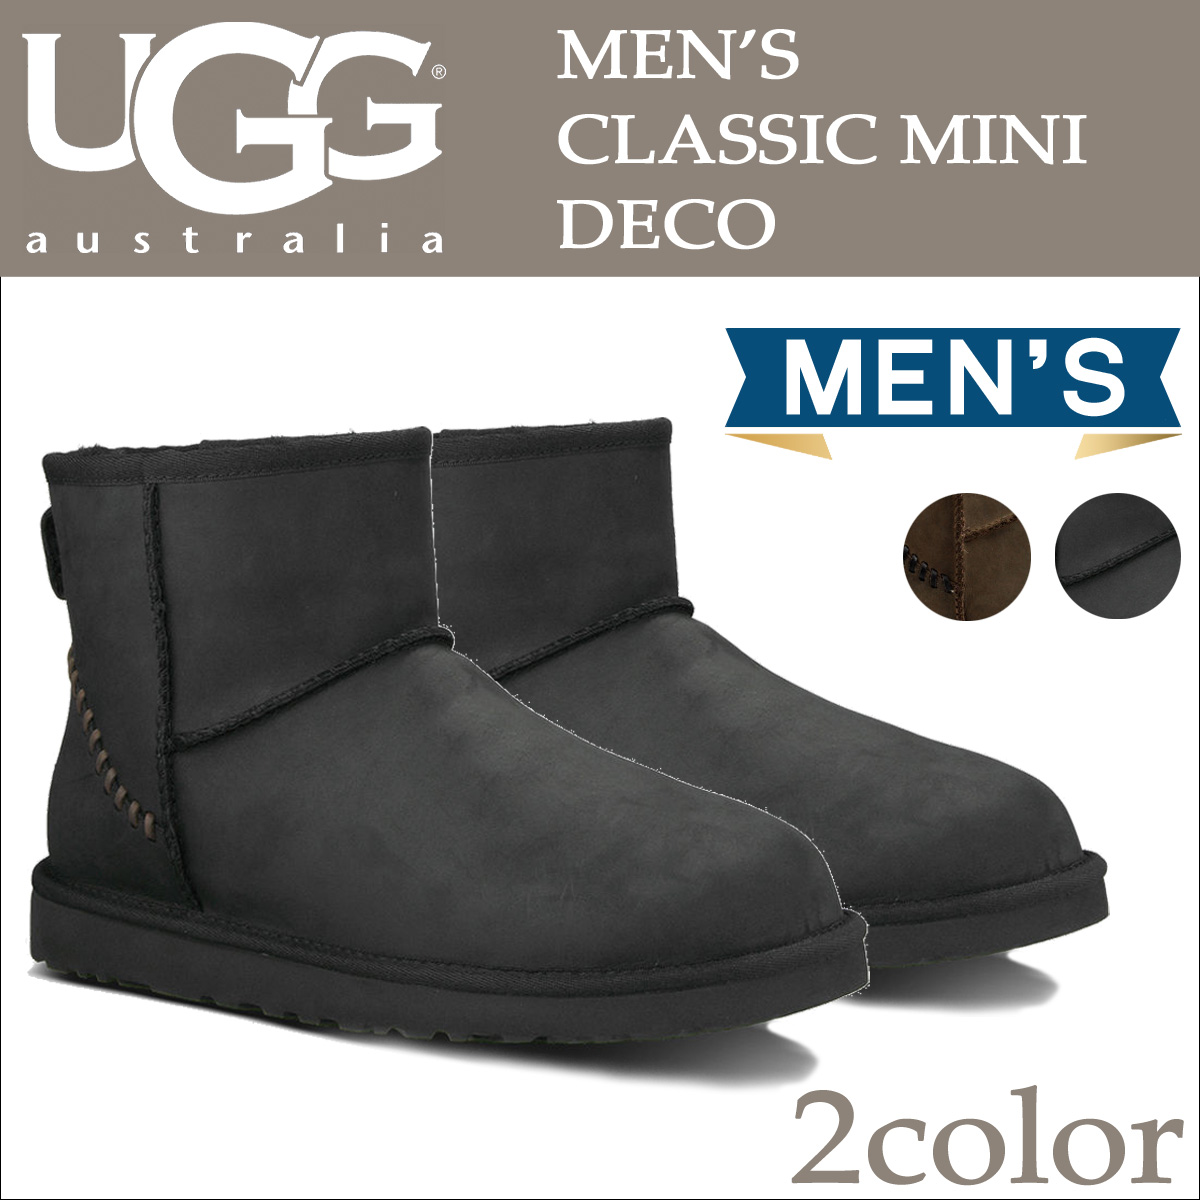 UGG アグ ムートンブーツ メンズ クラシック ミニ MENS CLASSIC MINI DECO 1003945